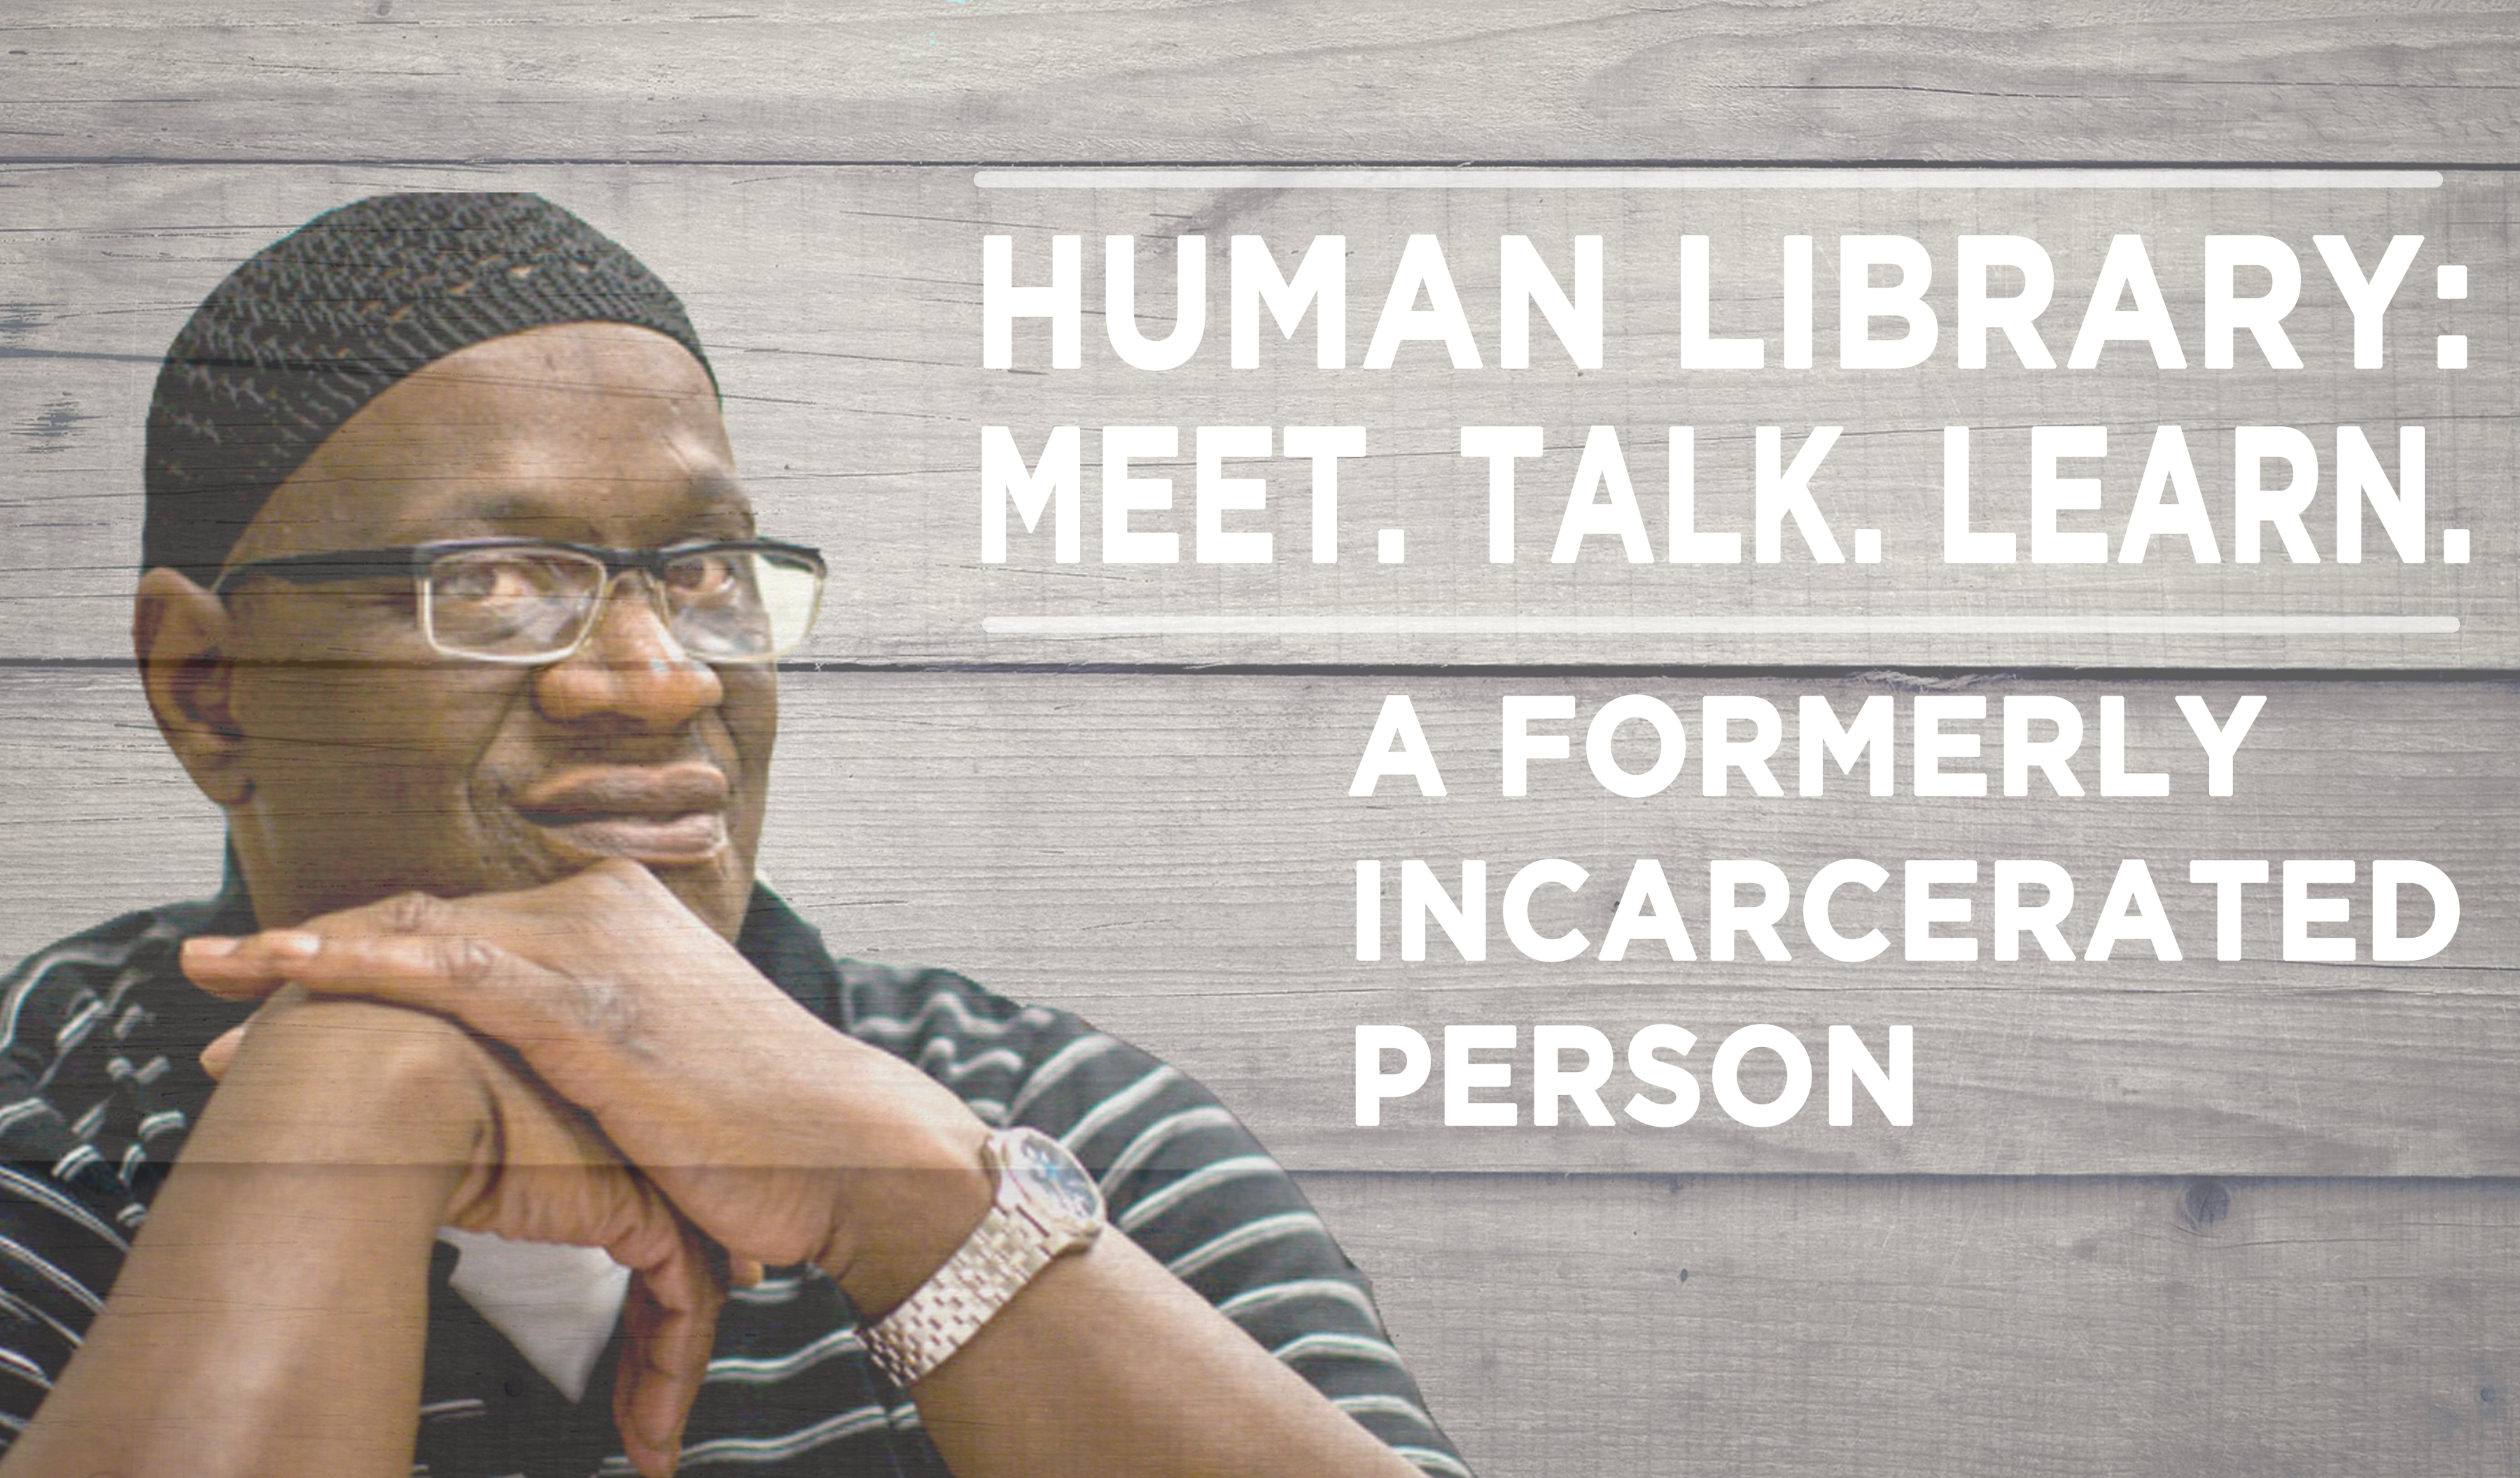 Human Library Logo2 - Incarcerated Person